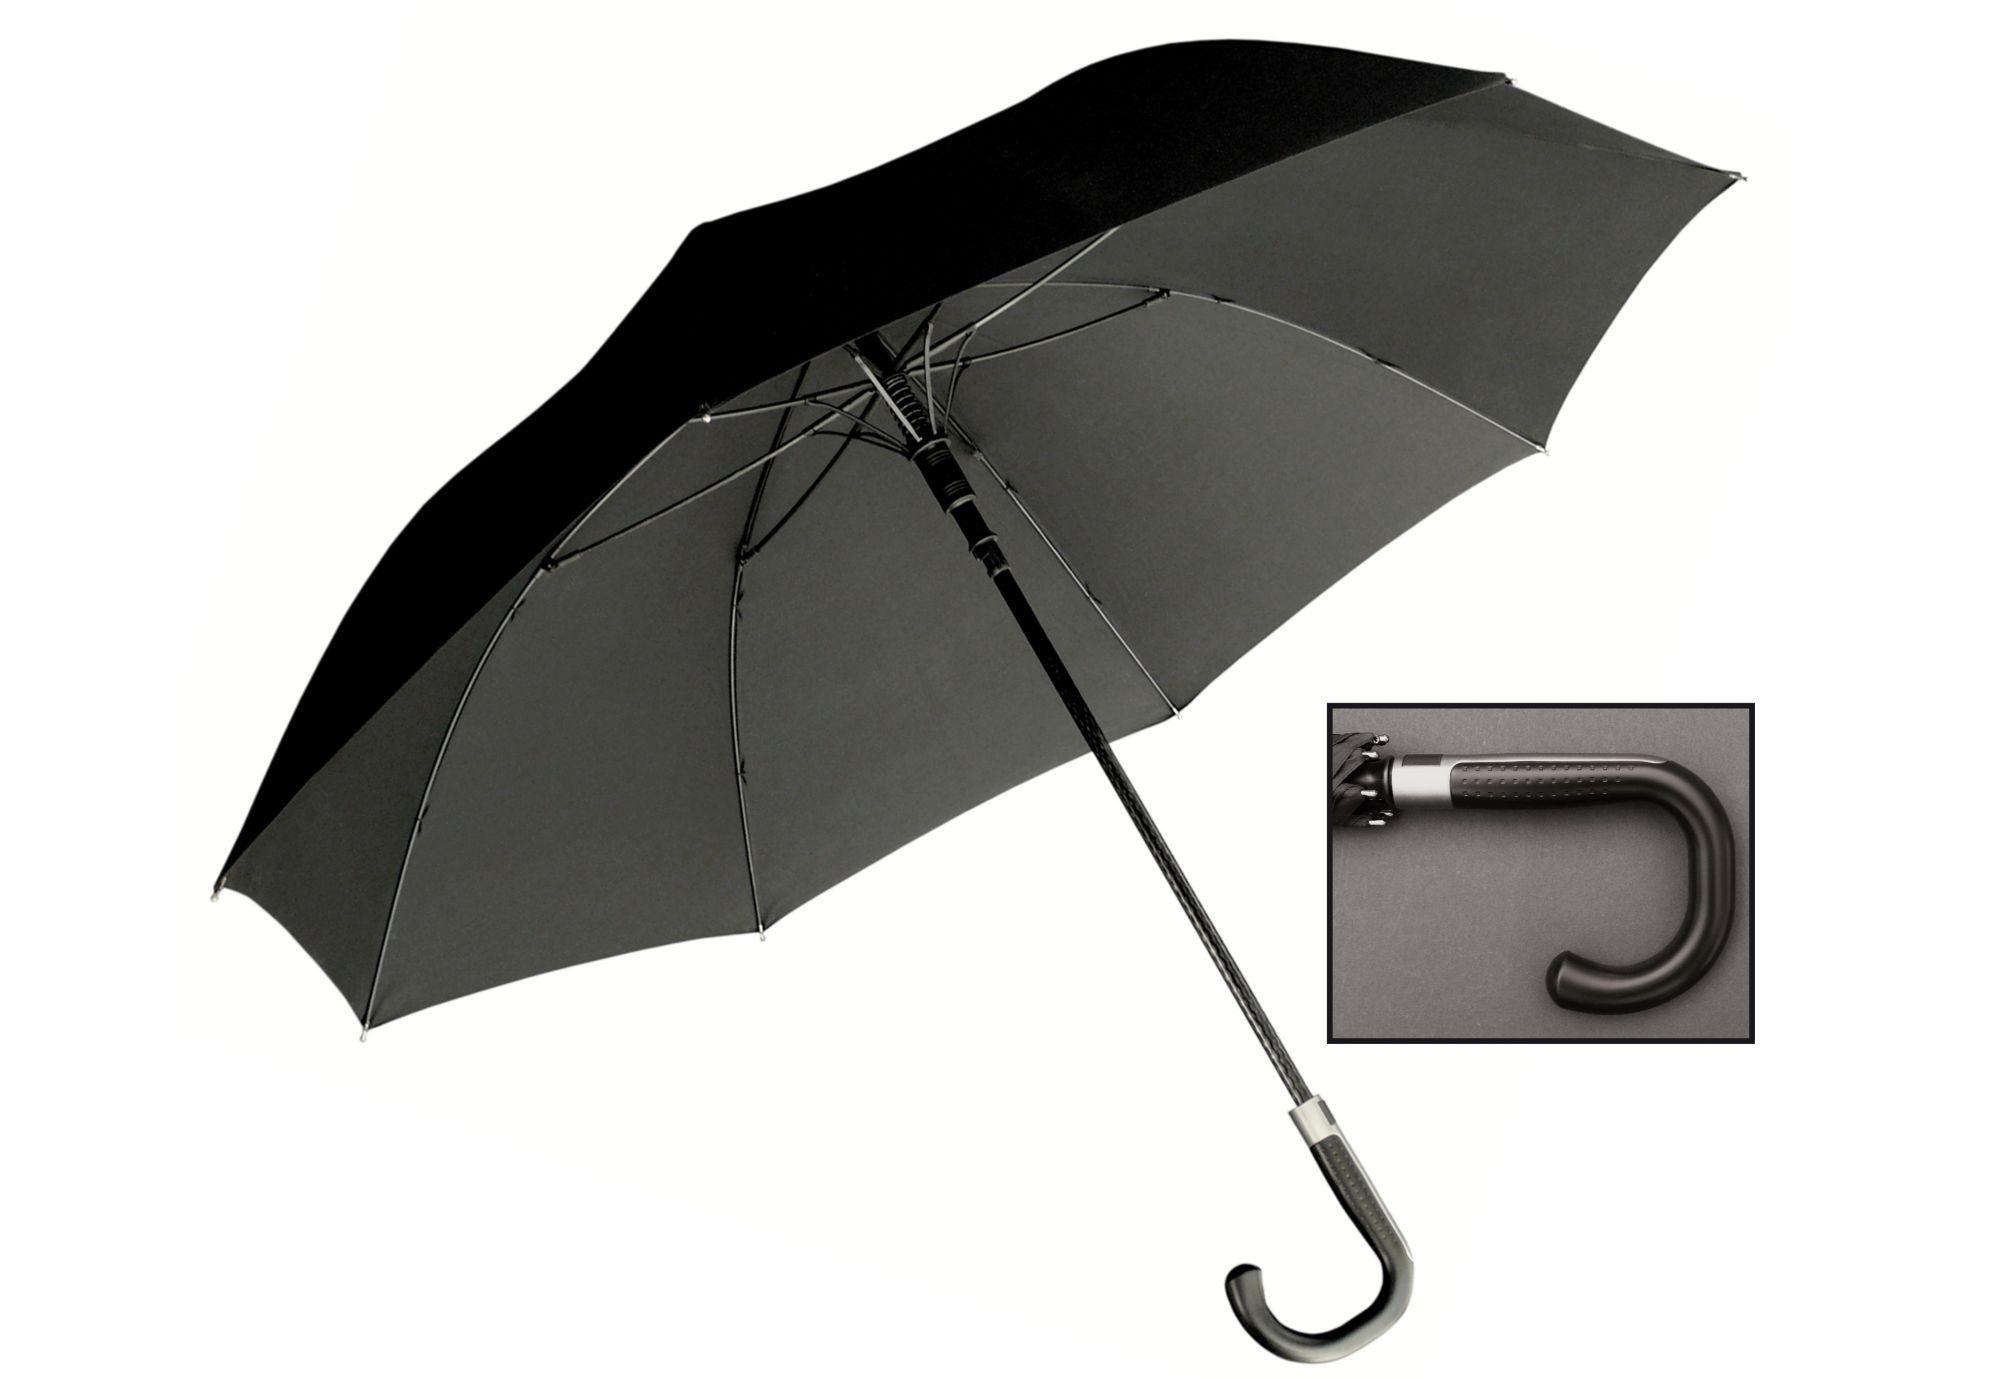 EUROSCHIRM® Euroschirm® Regenschirm für Zwei, »Partnerschirm«